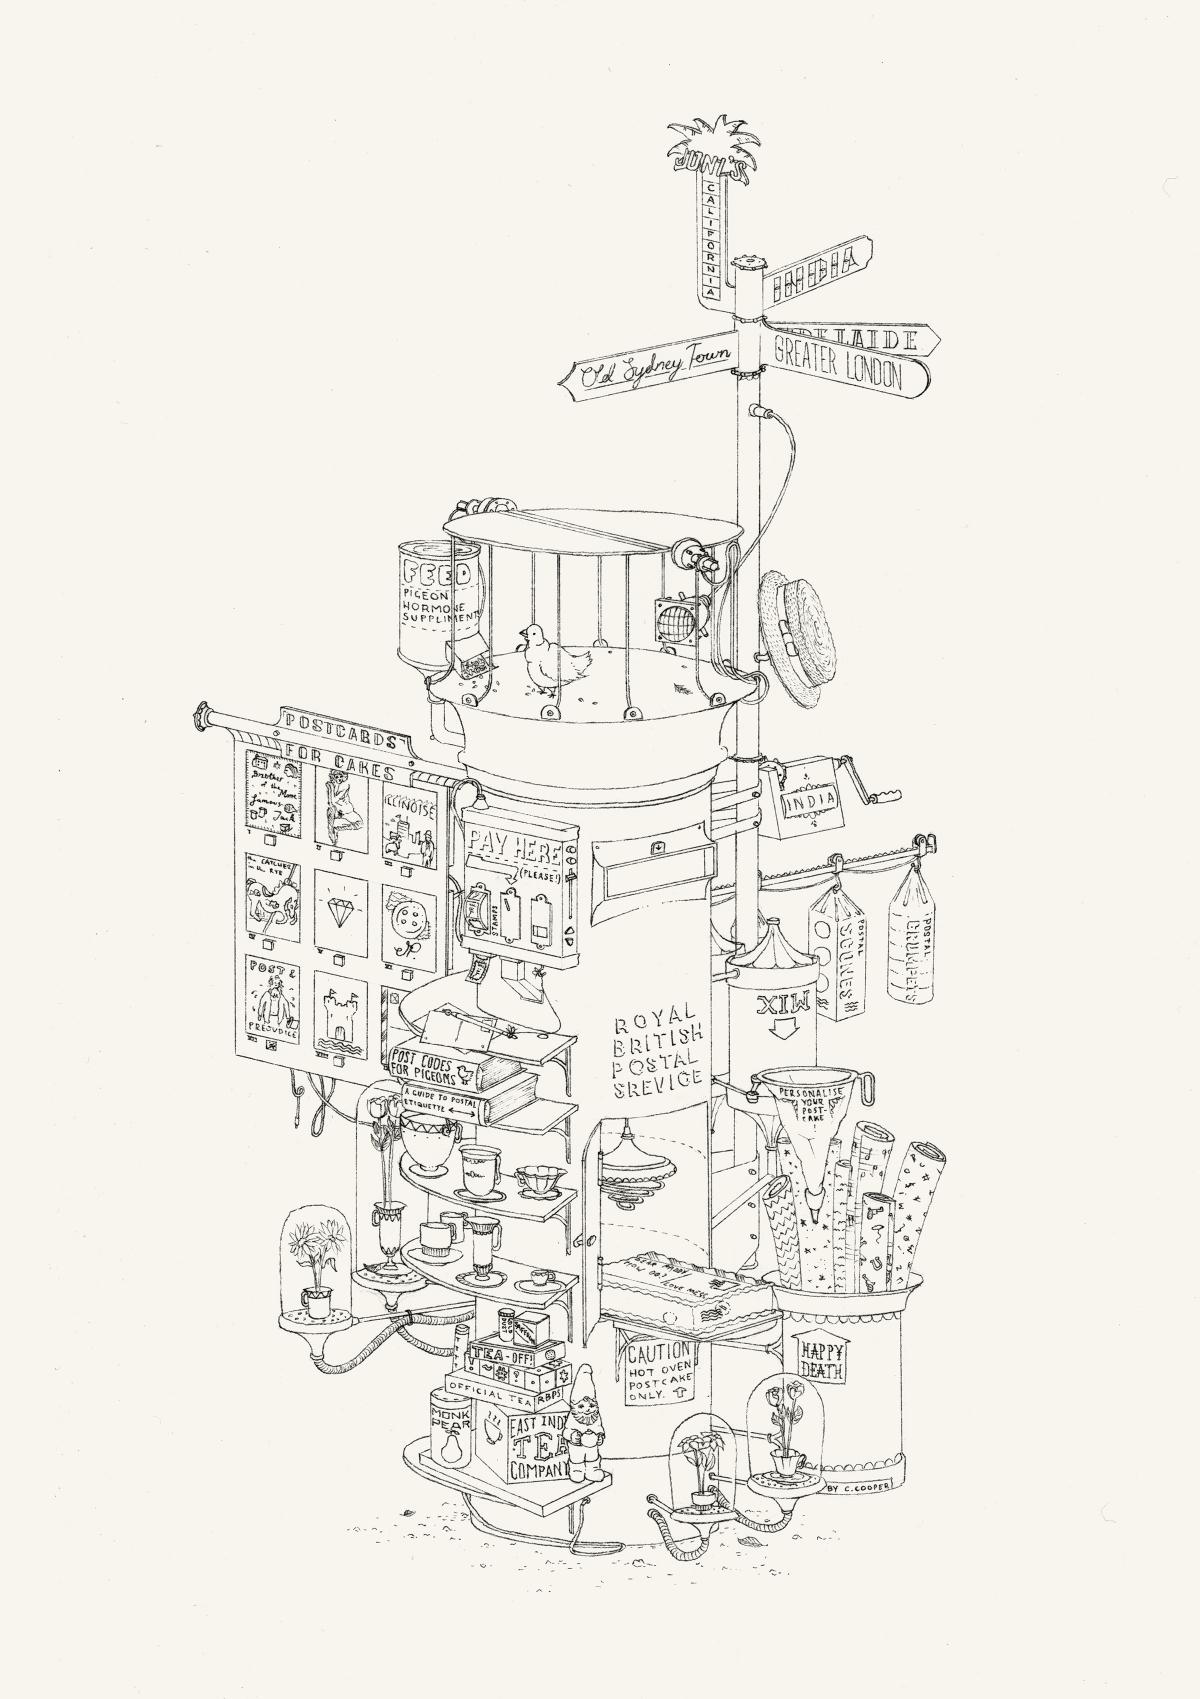 An illustration of the new royal british postal service pillar box.